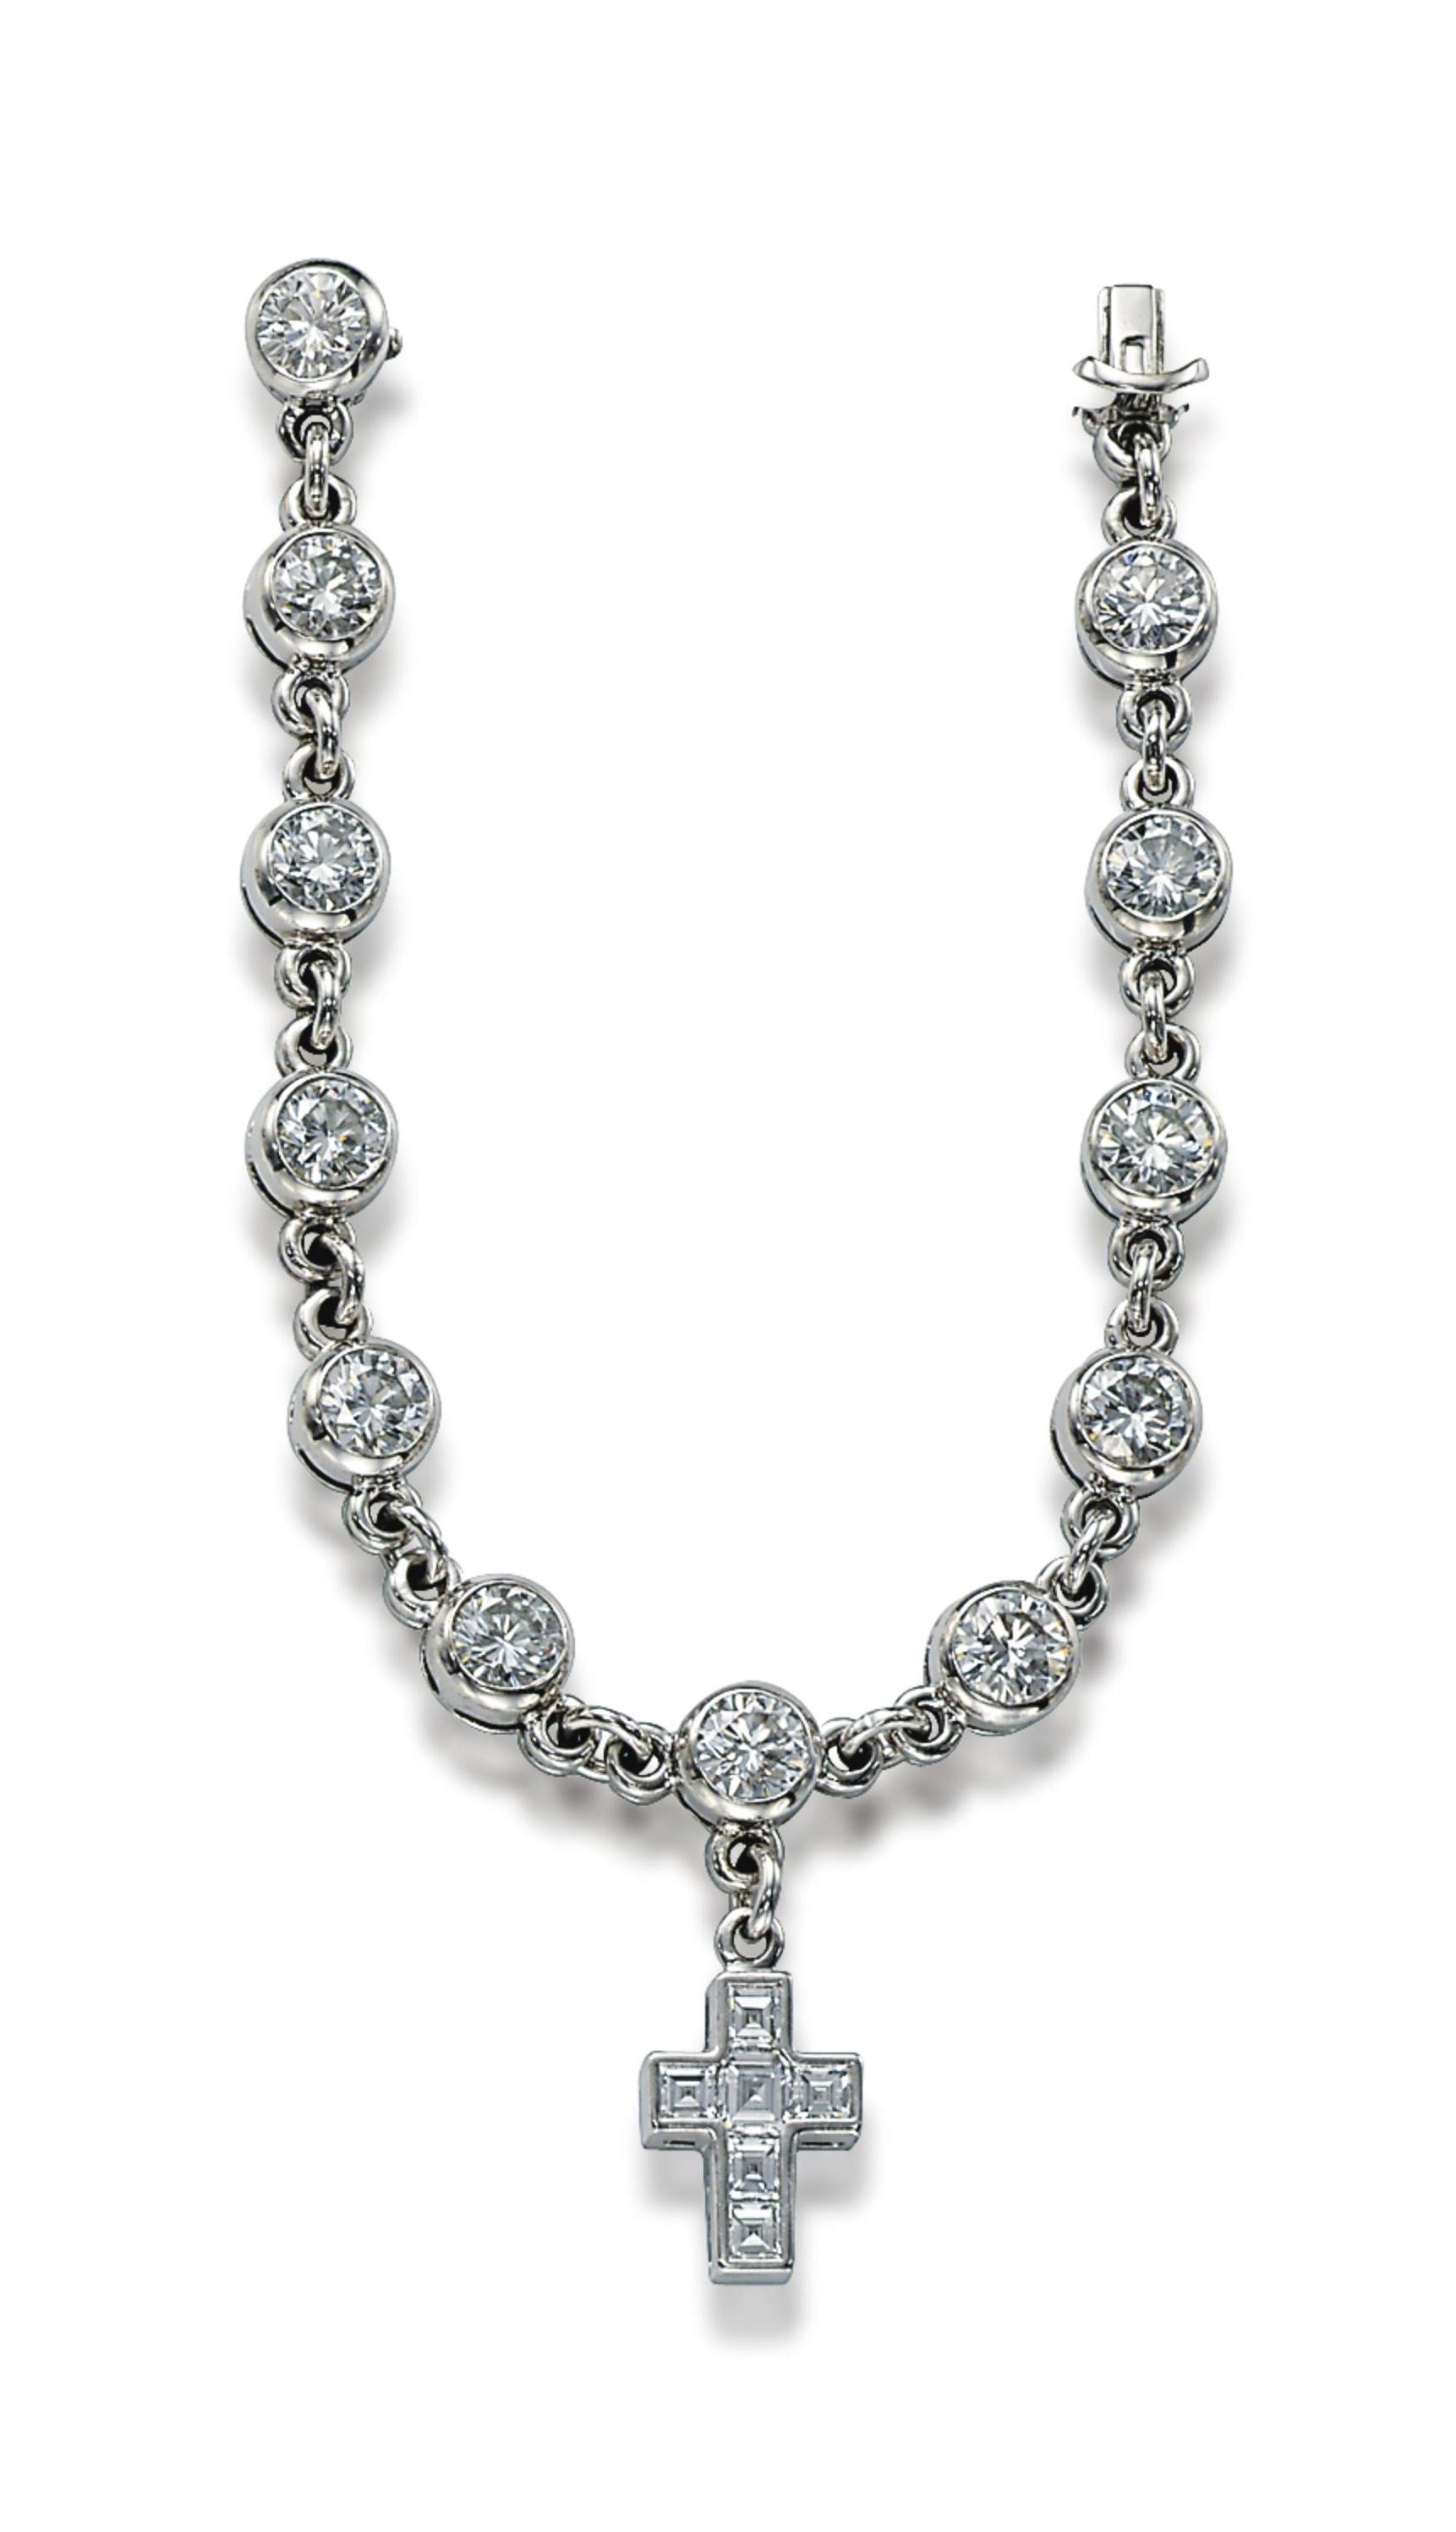 A DIAMOND CHARM BRACELET, BY G